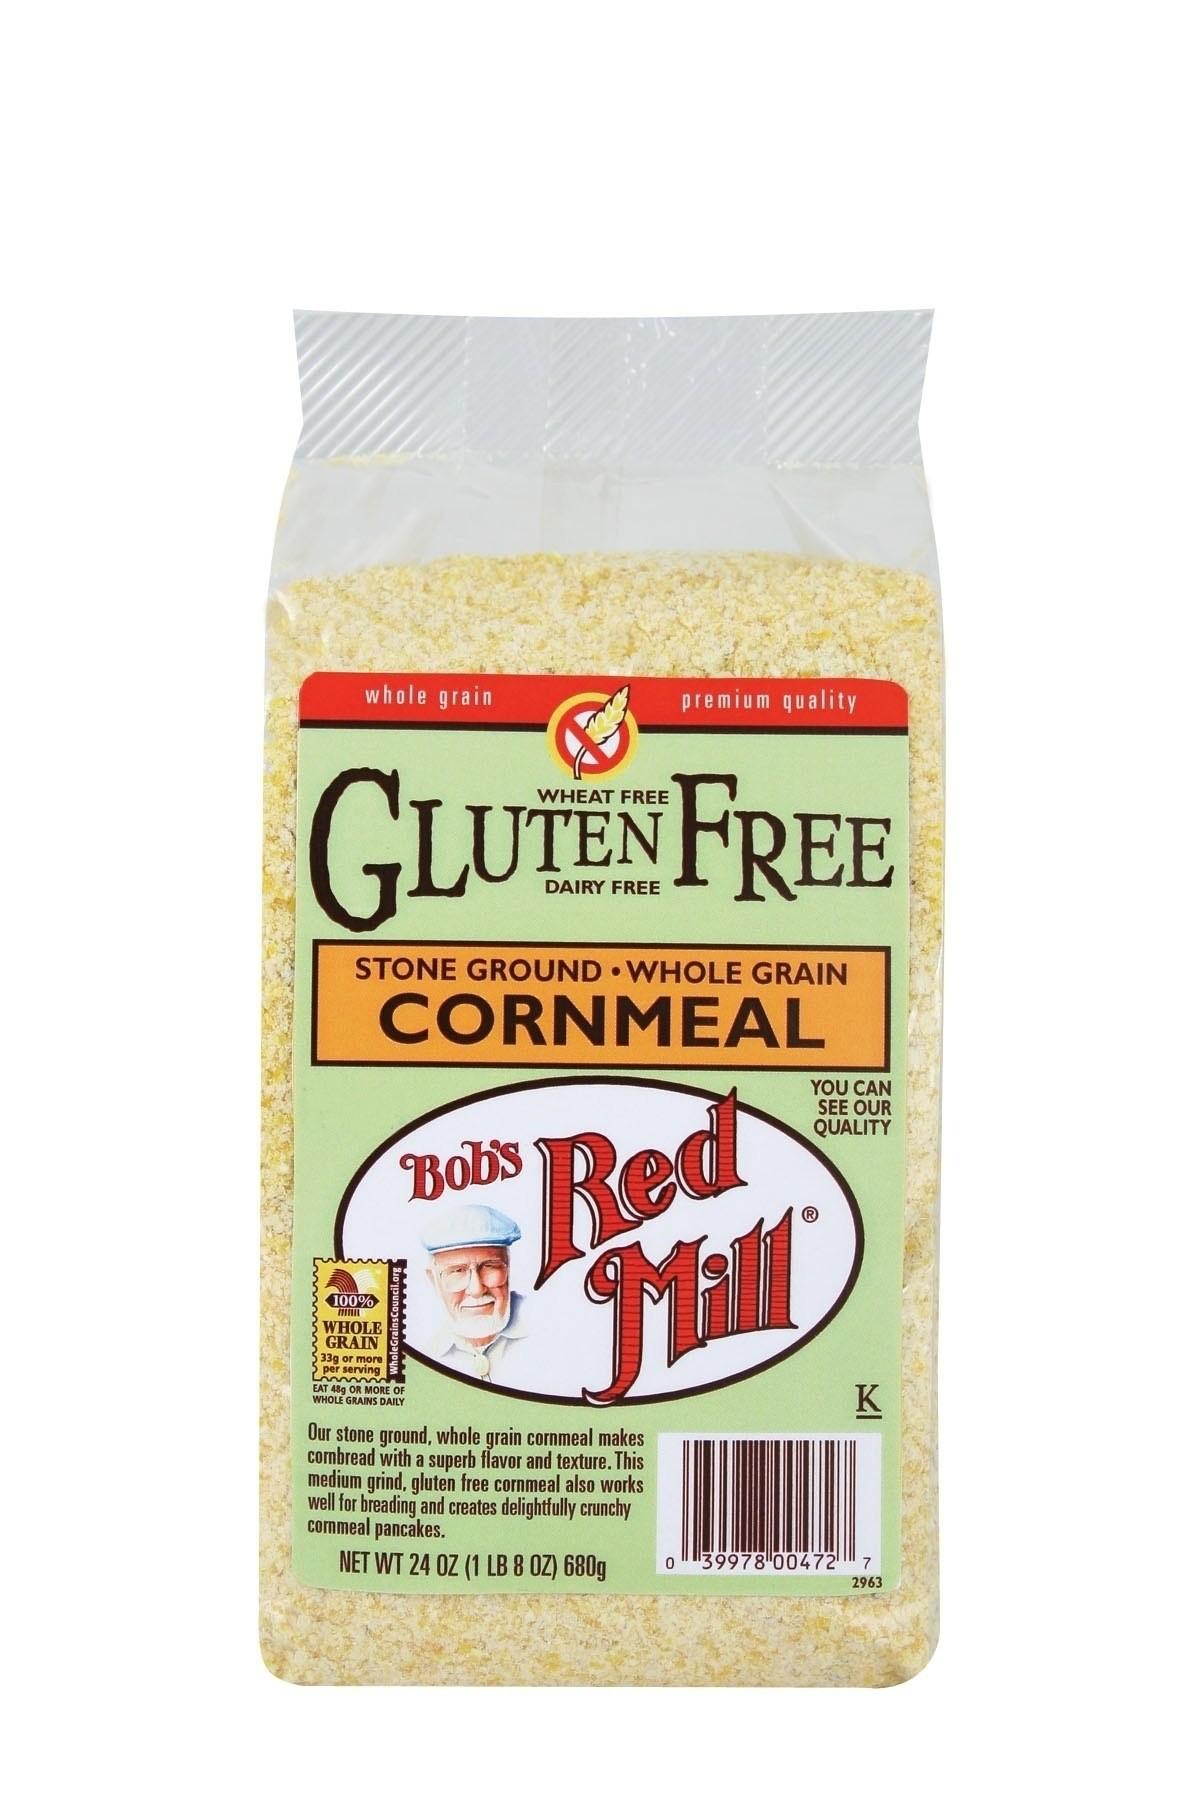 1620c244_glutenfree_cornmeal_f_1800.jpg